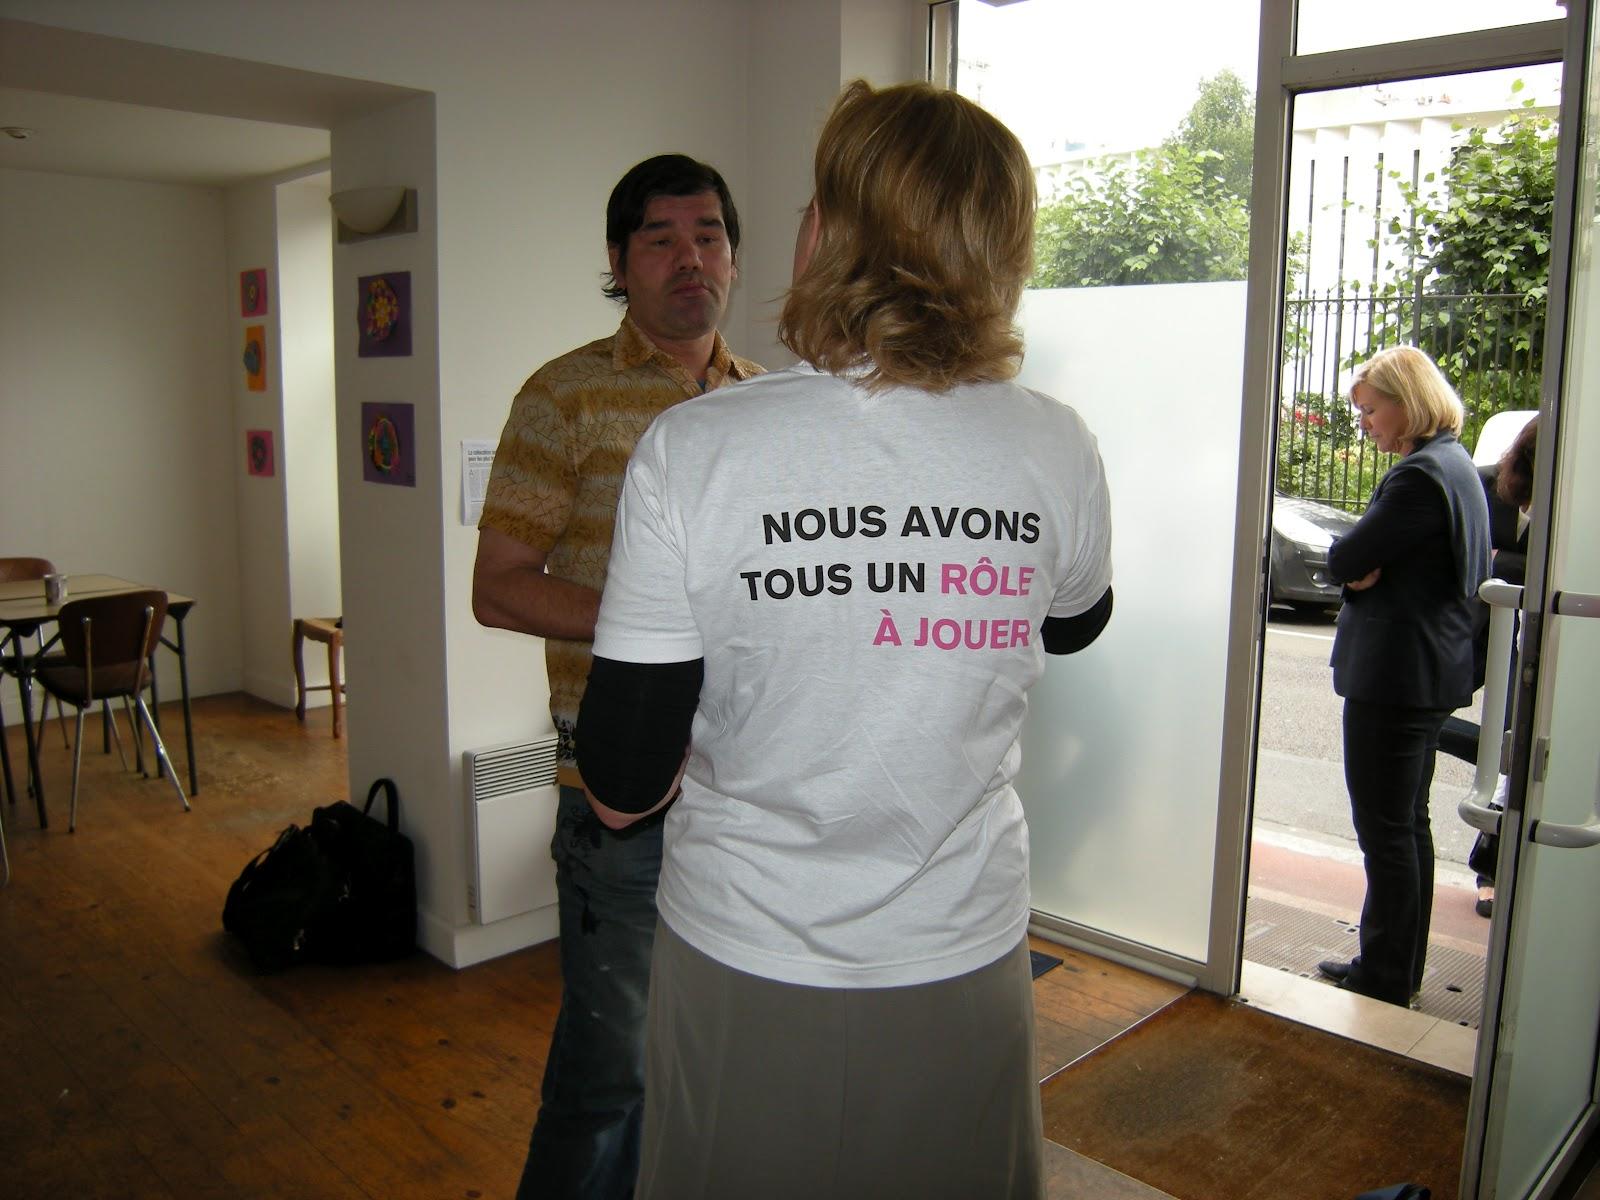 gem la porte bonheur  citizen day l u0026 39 or u00e9al